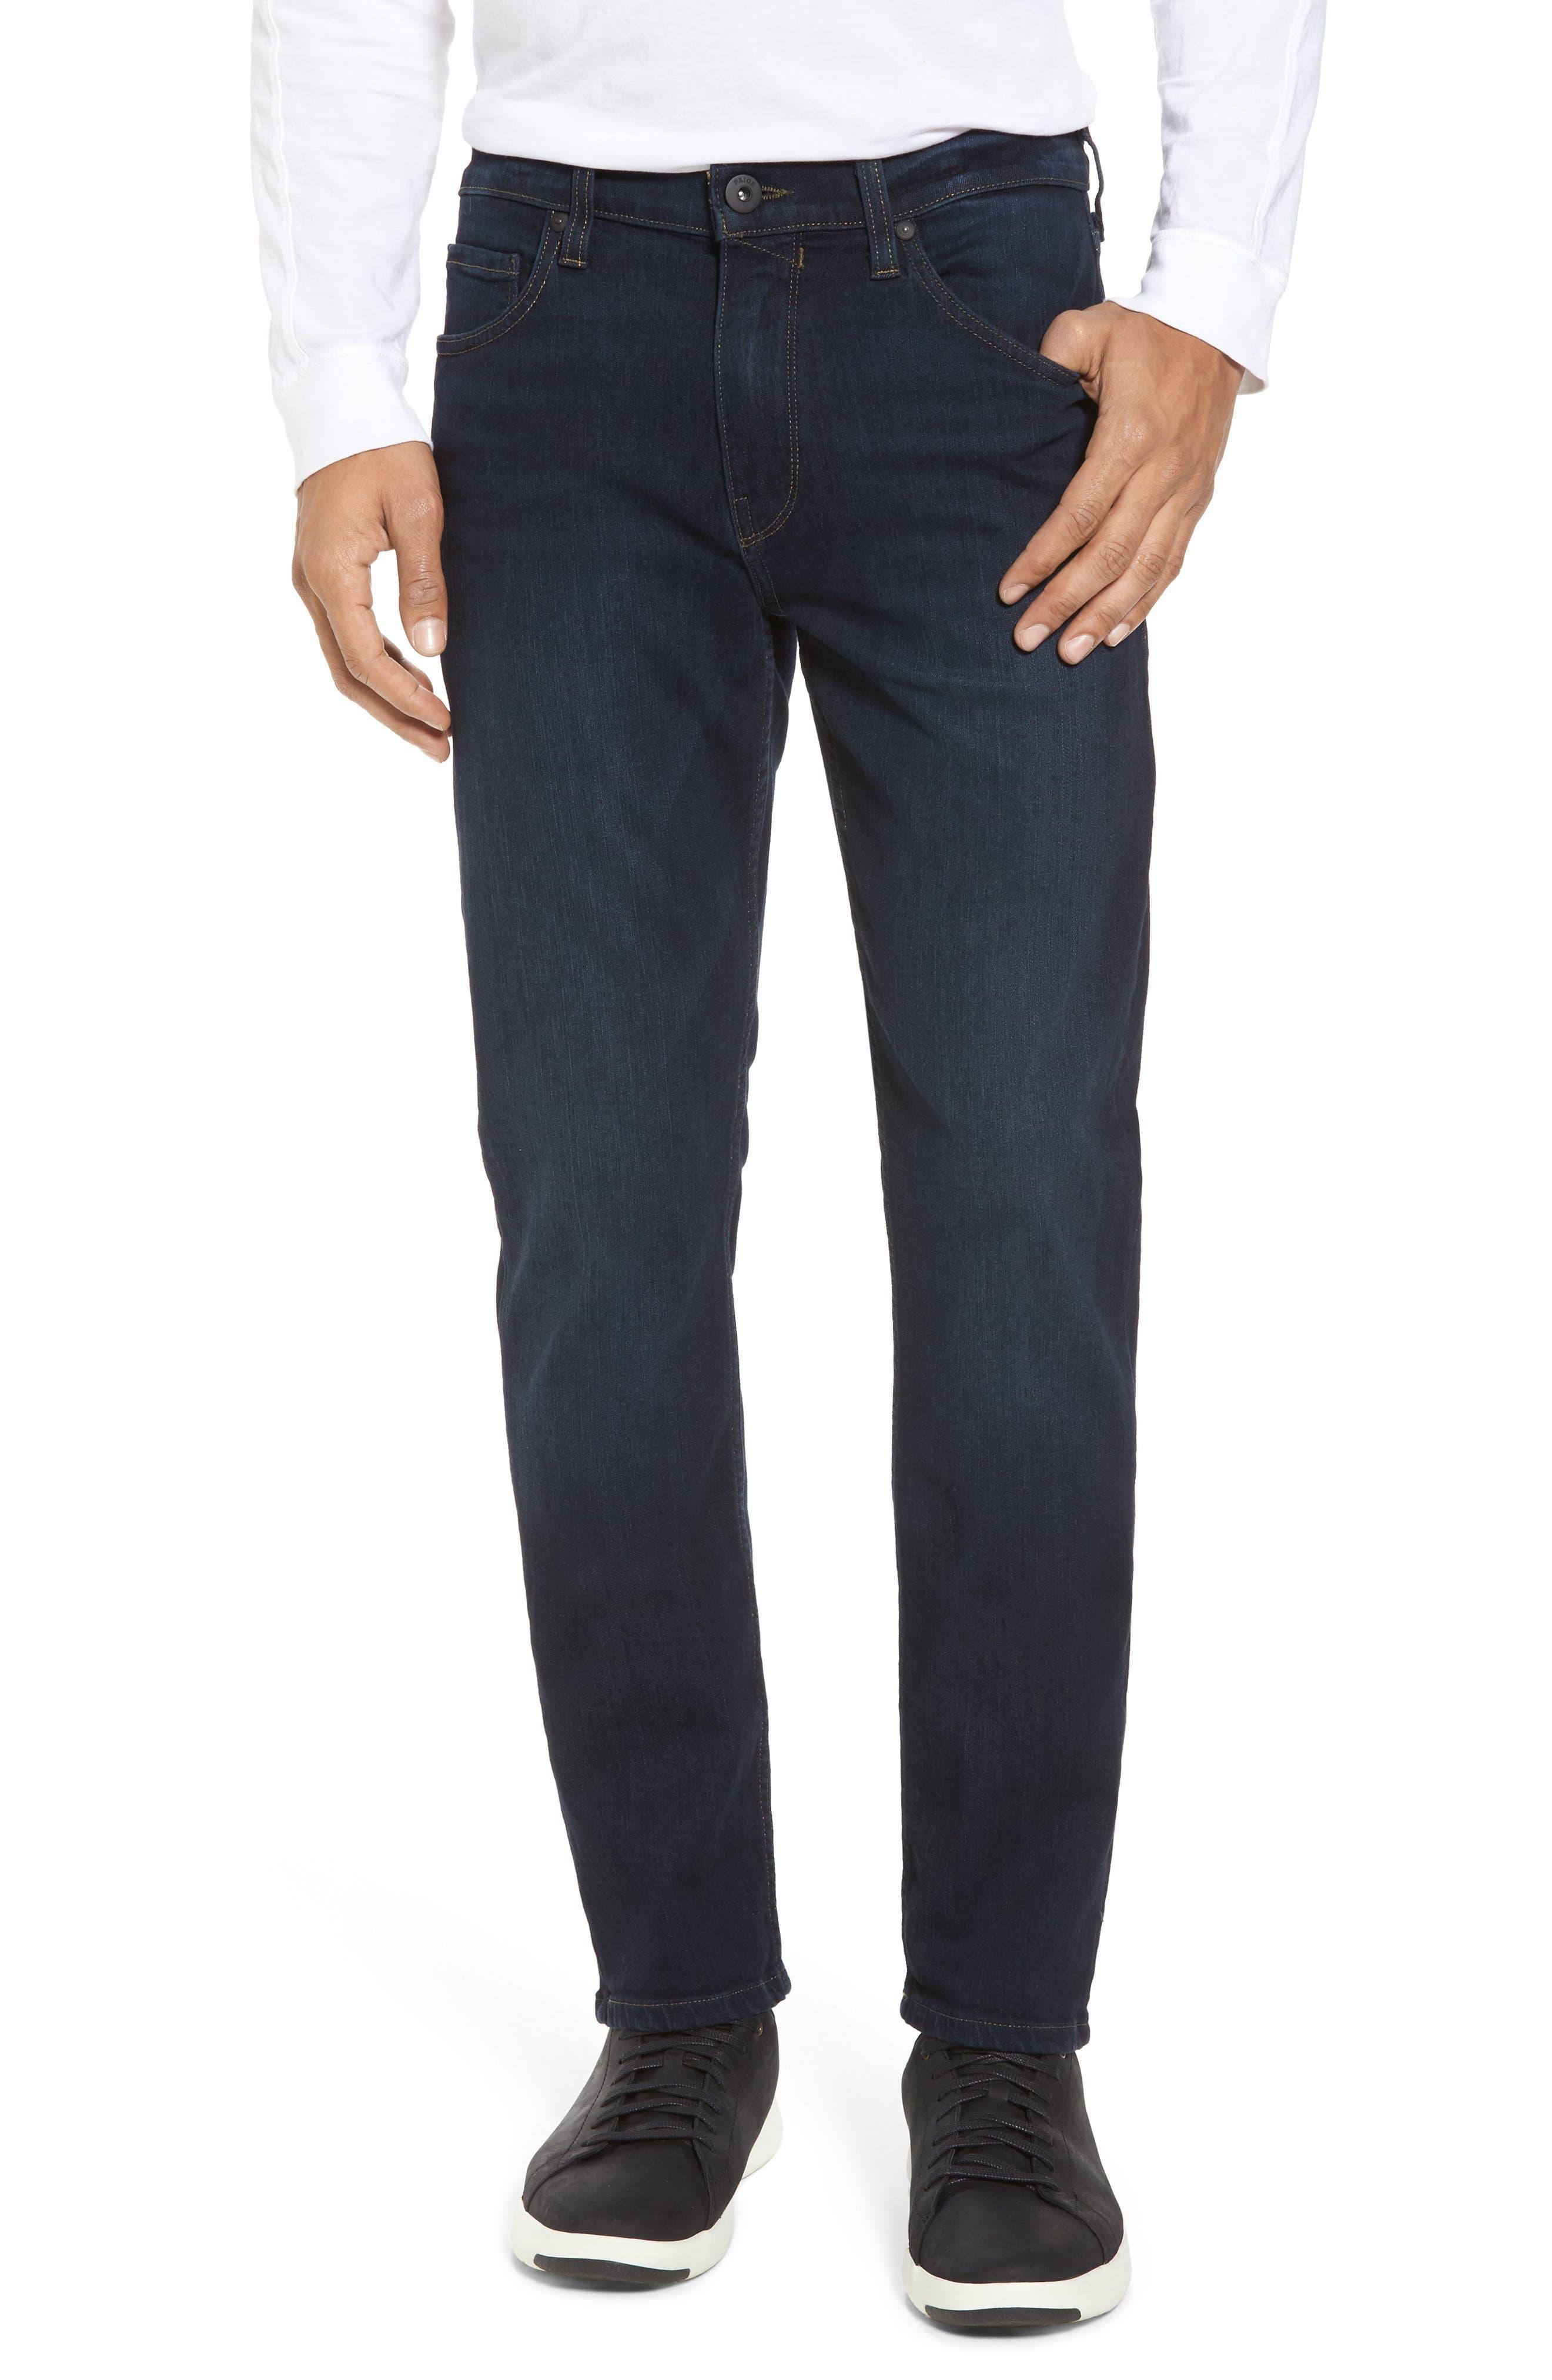 Lennox Slim Fit Jeans,                         Main,                         color, Jonathan